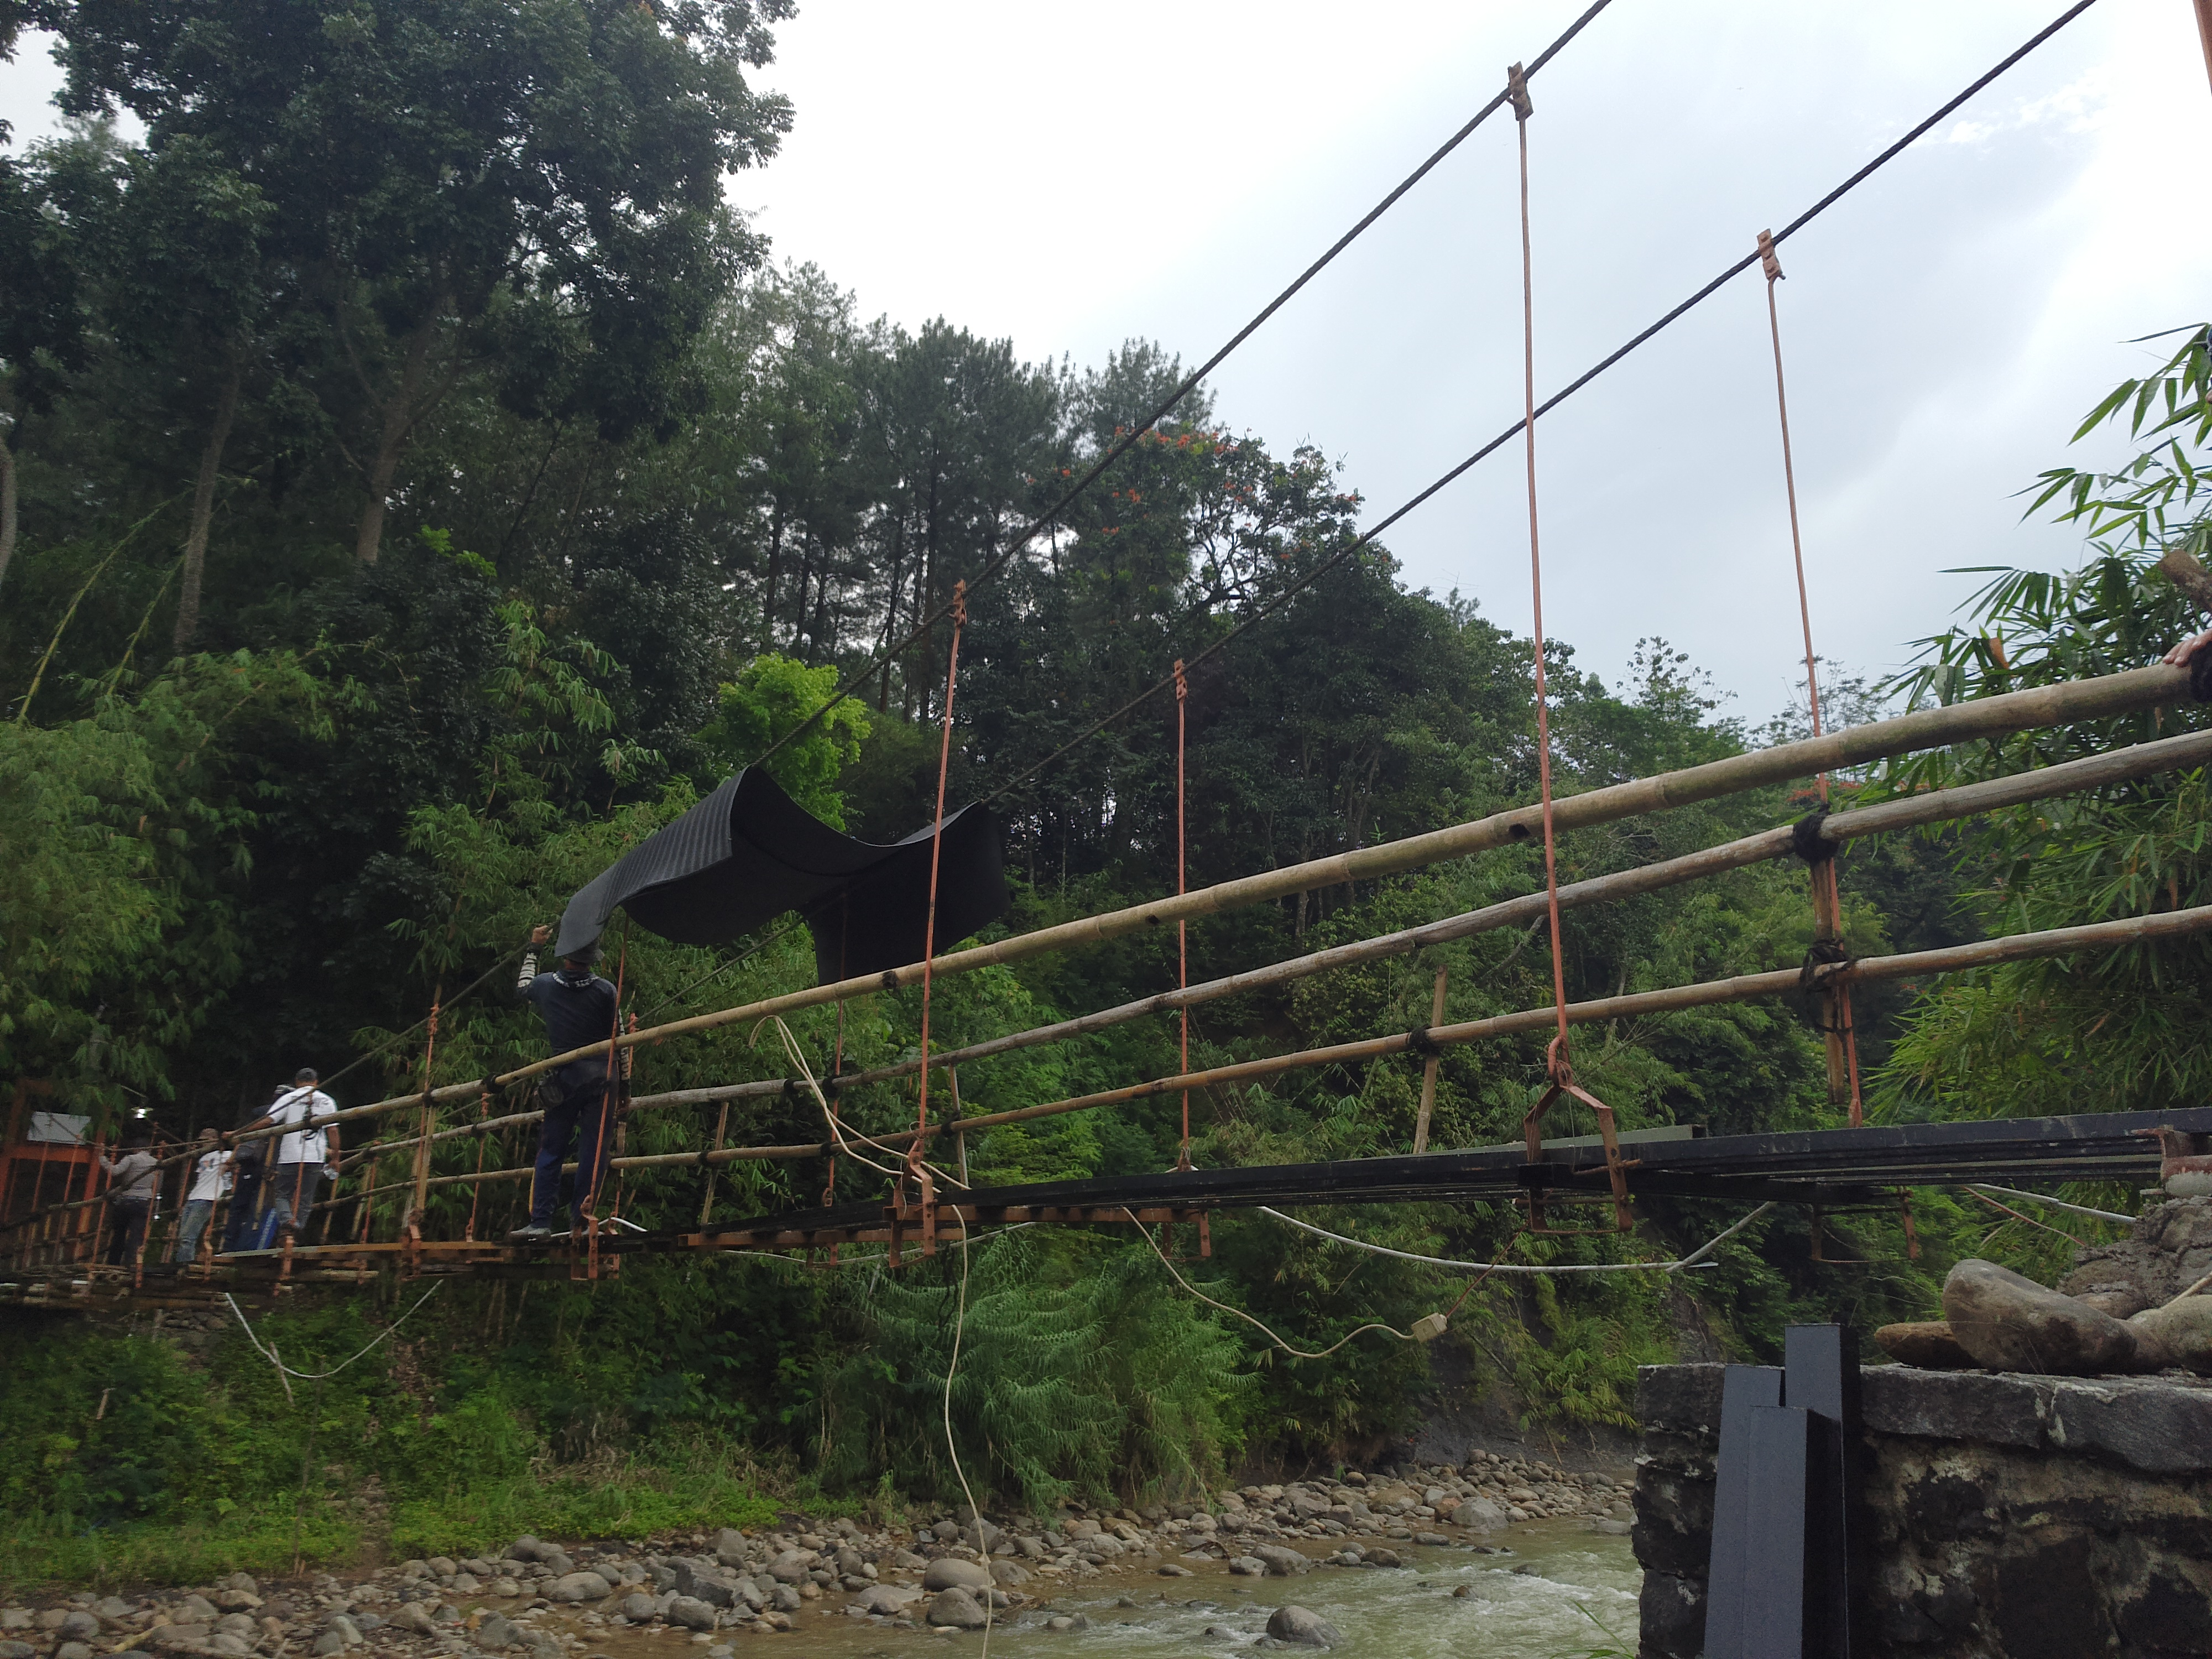 Badan jembatan | Foto: Vita Ayu Anggraeni / GNFI